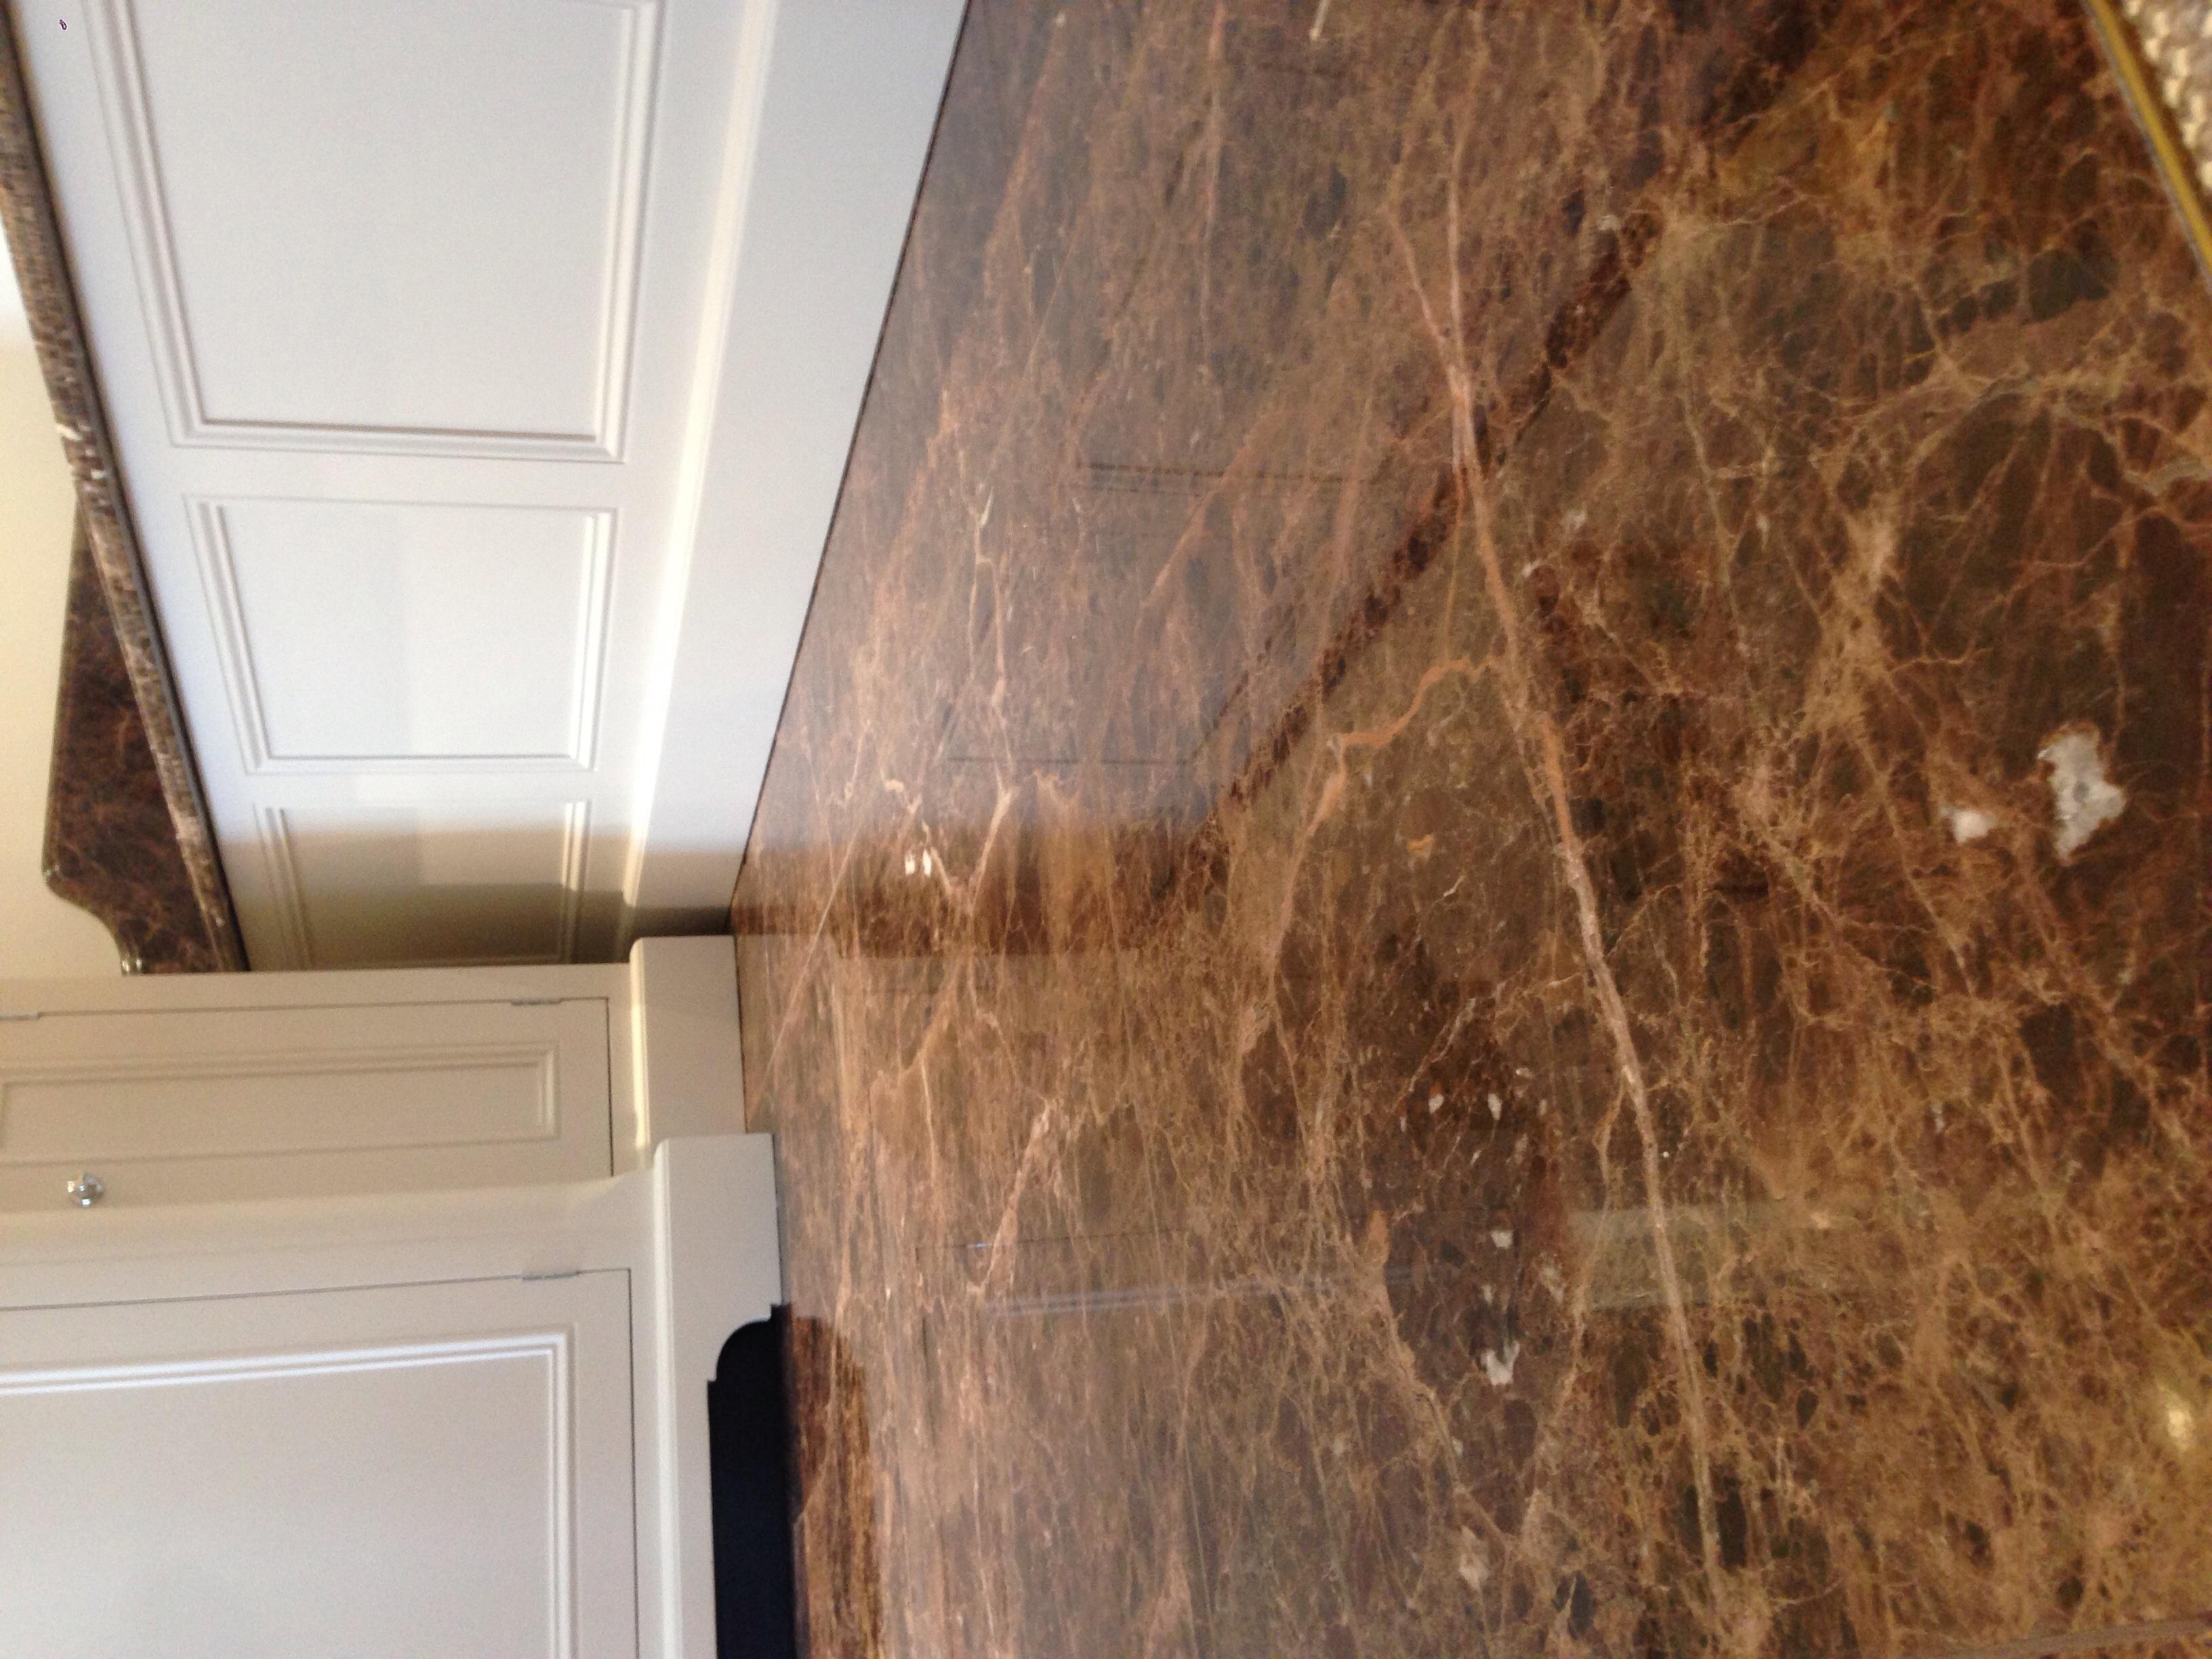 Marble Stone Floor : Marble stone floor